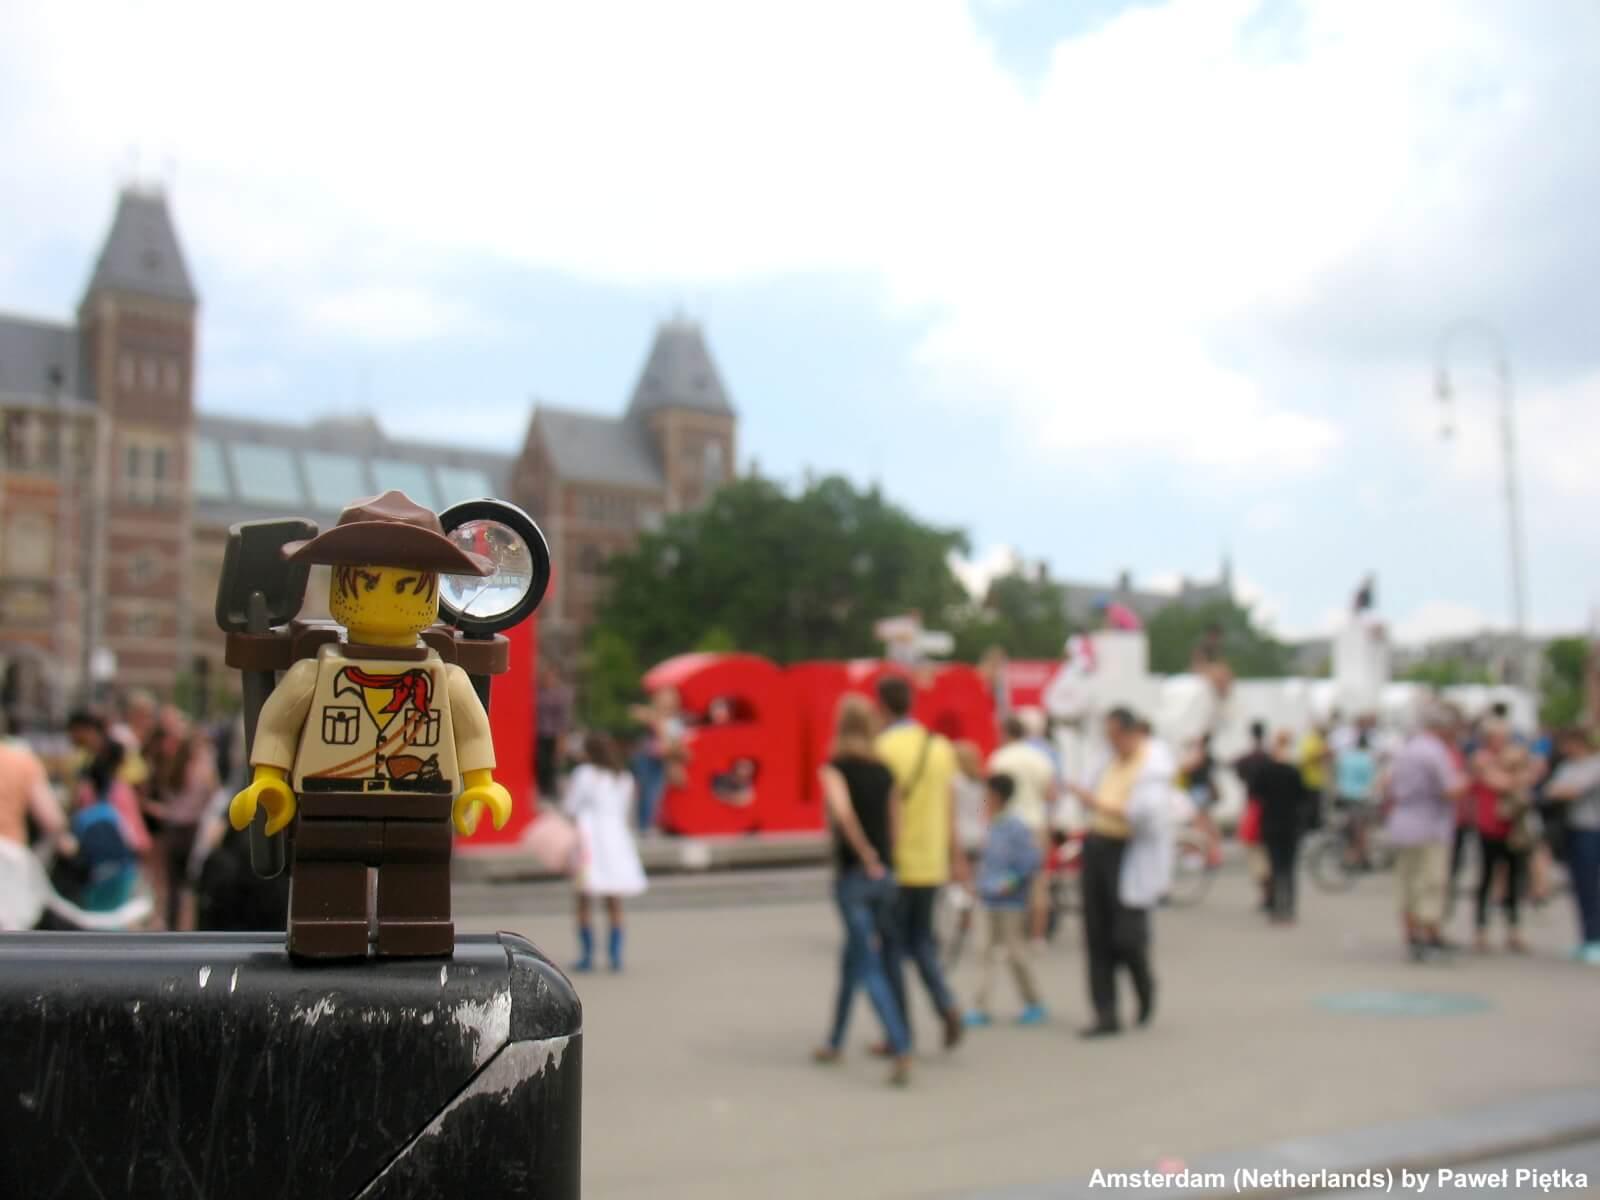 Amsterdam (Netherlands) - Rijksmuseum